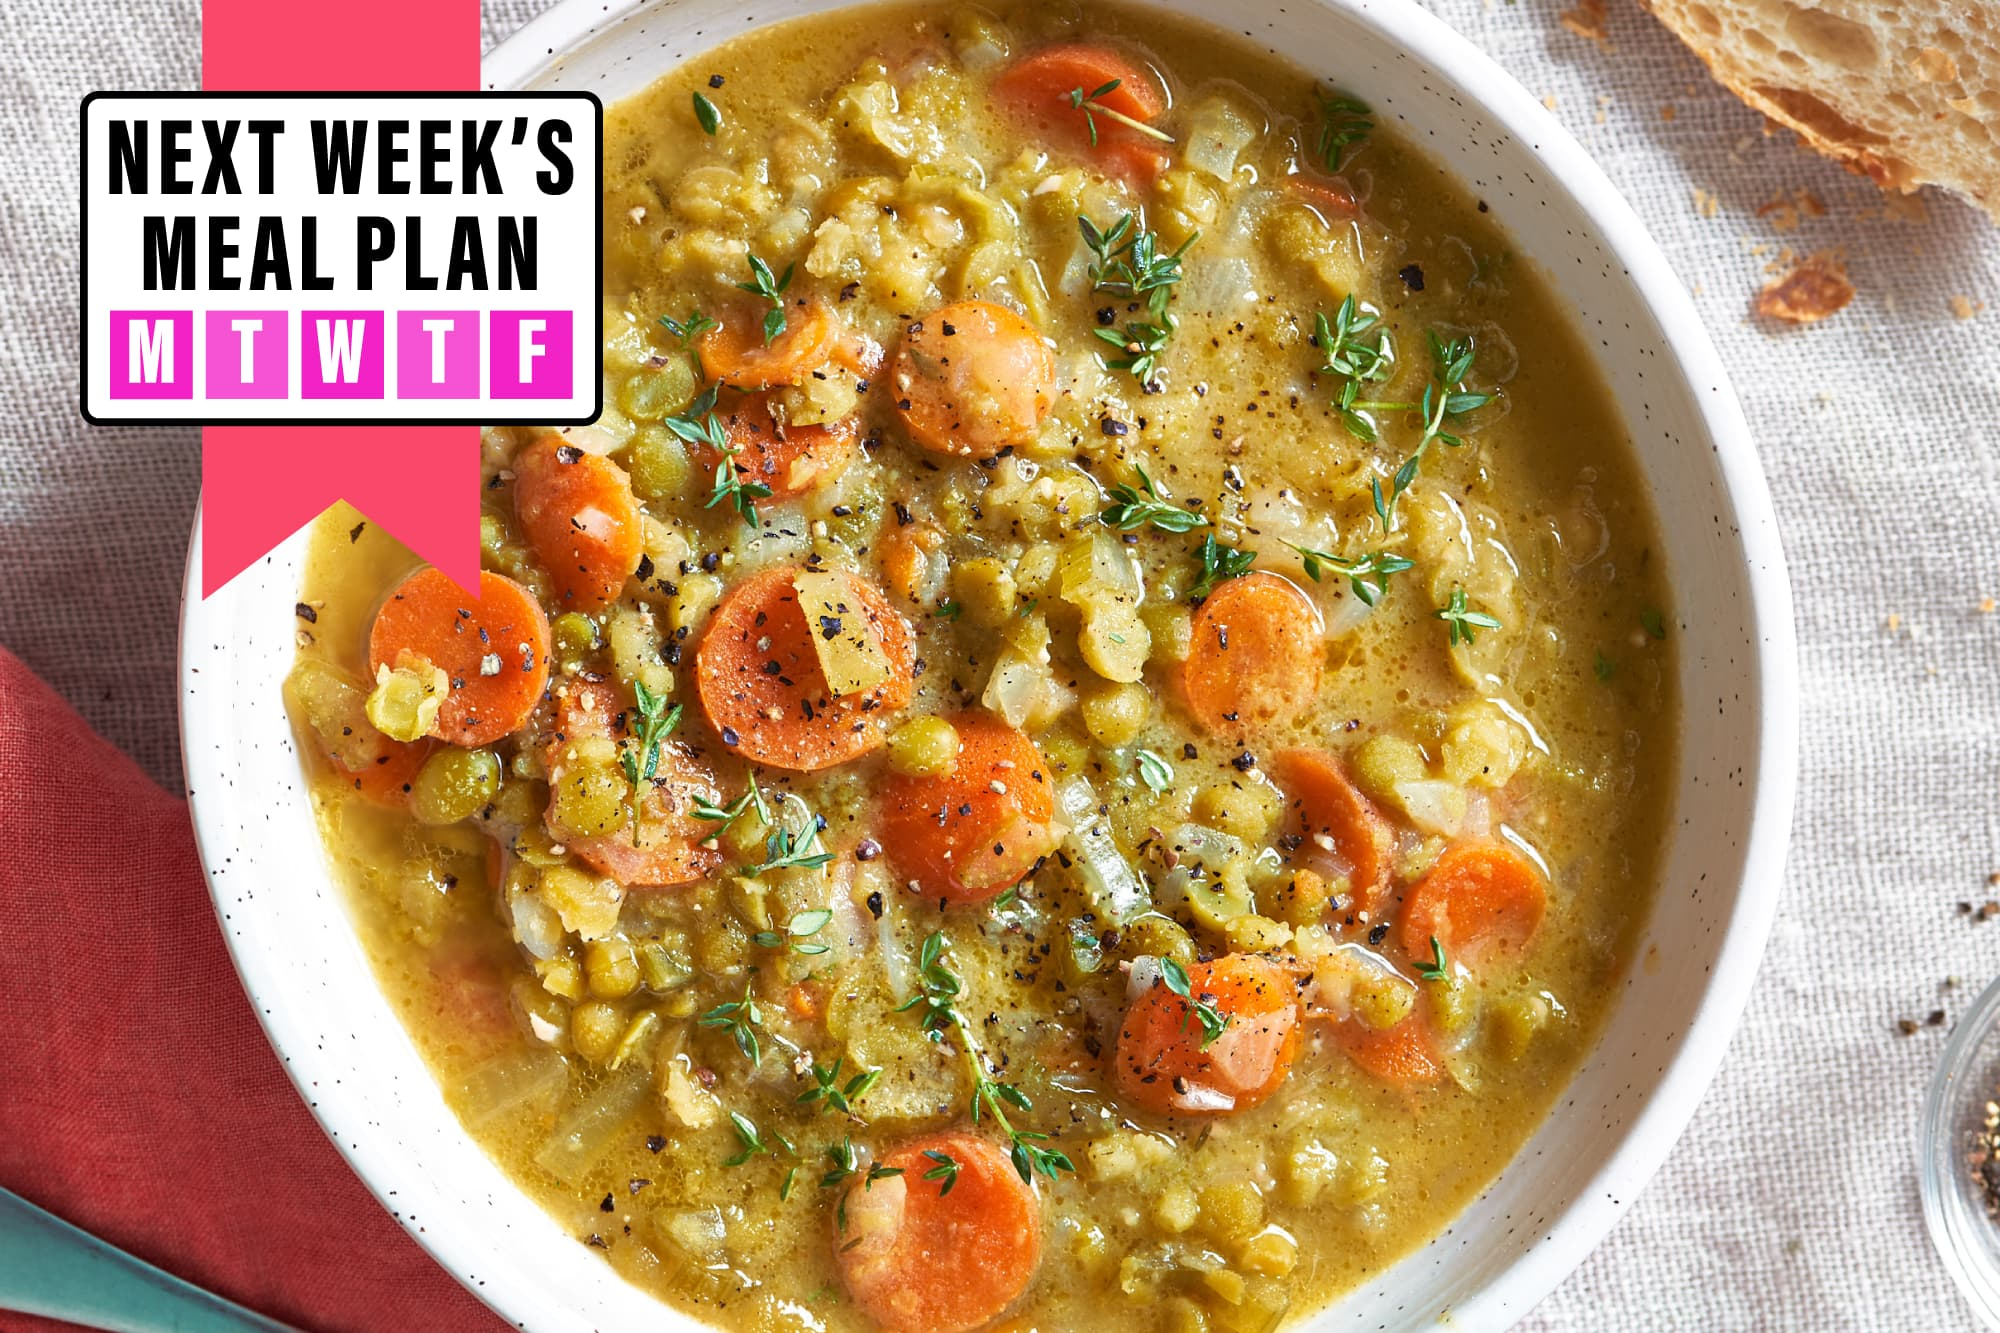 Next Week's Meal Plan: 5 Feel-Good Dinners for the Week Ahead